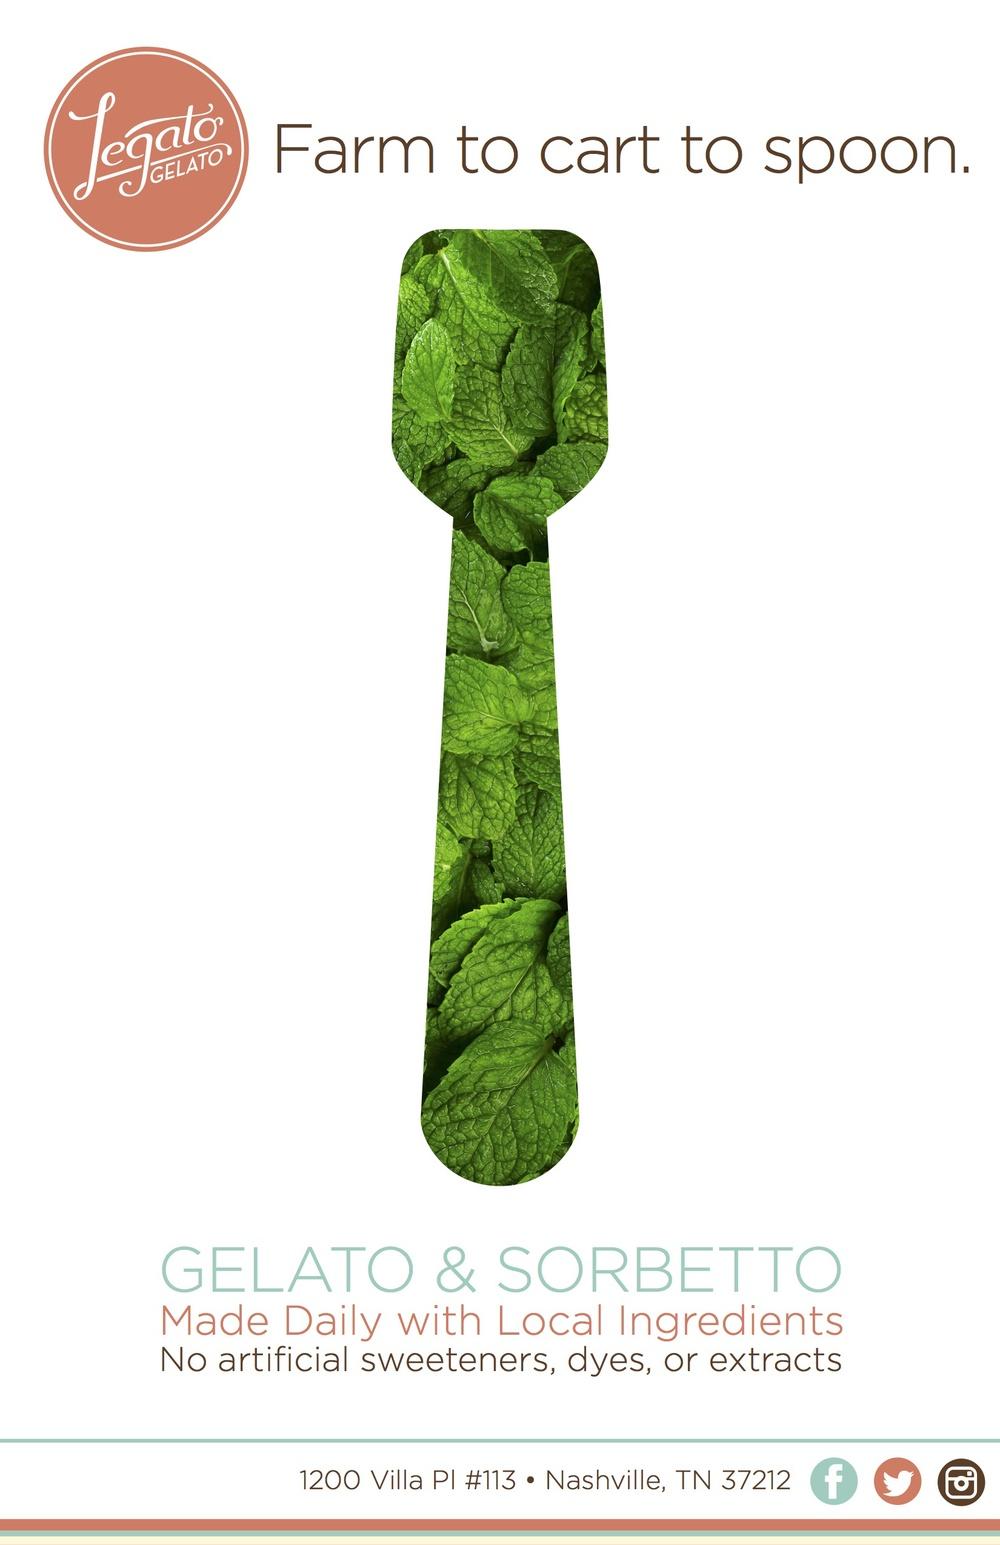 Legato_Signage_Mint.jpg